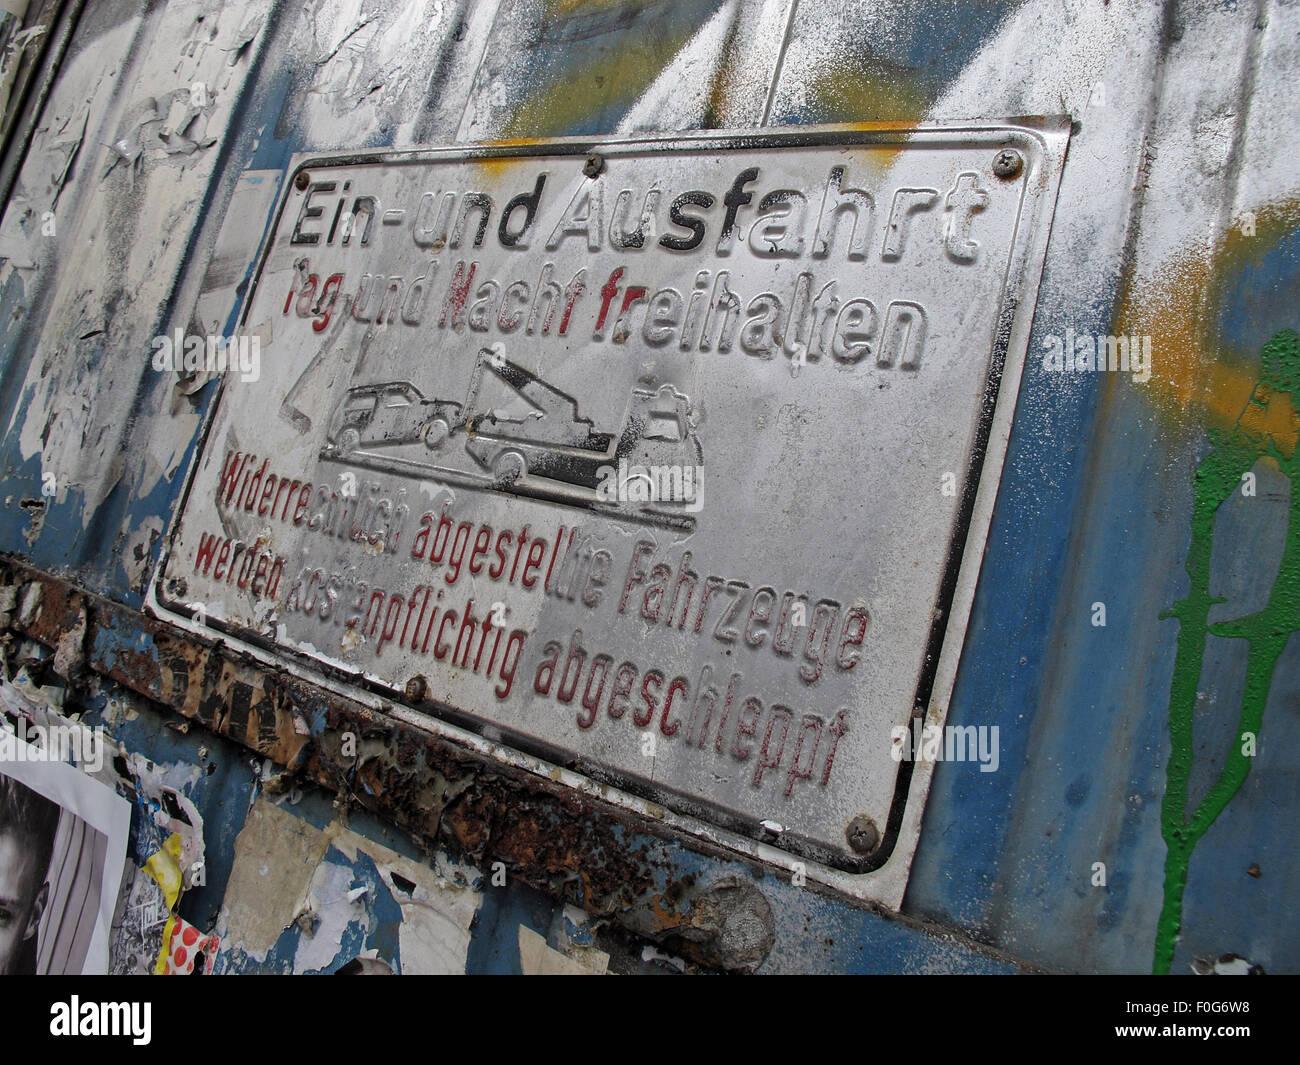 Mitte,DircksenStr,Berlin,Germany,streetArt,artist,of,the,streetsmixedmedia,mixed,media,poster,paper,wall,walls,city,cities,urban,hipster,controversial,Ein-und,EinUnd,Ausfahrt,parking,towaway,tow,away,sign,covered,in,paint,painted,spray,sprayed,GoTonySmith,Deutsche,Deutschland,Buy Pictures of,Buy Images Of